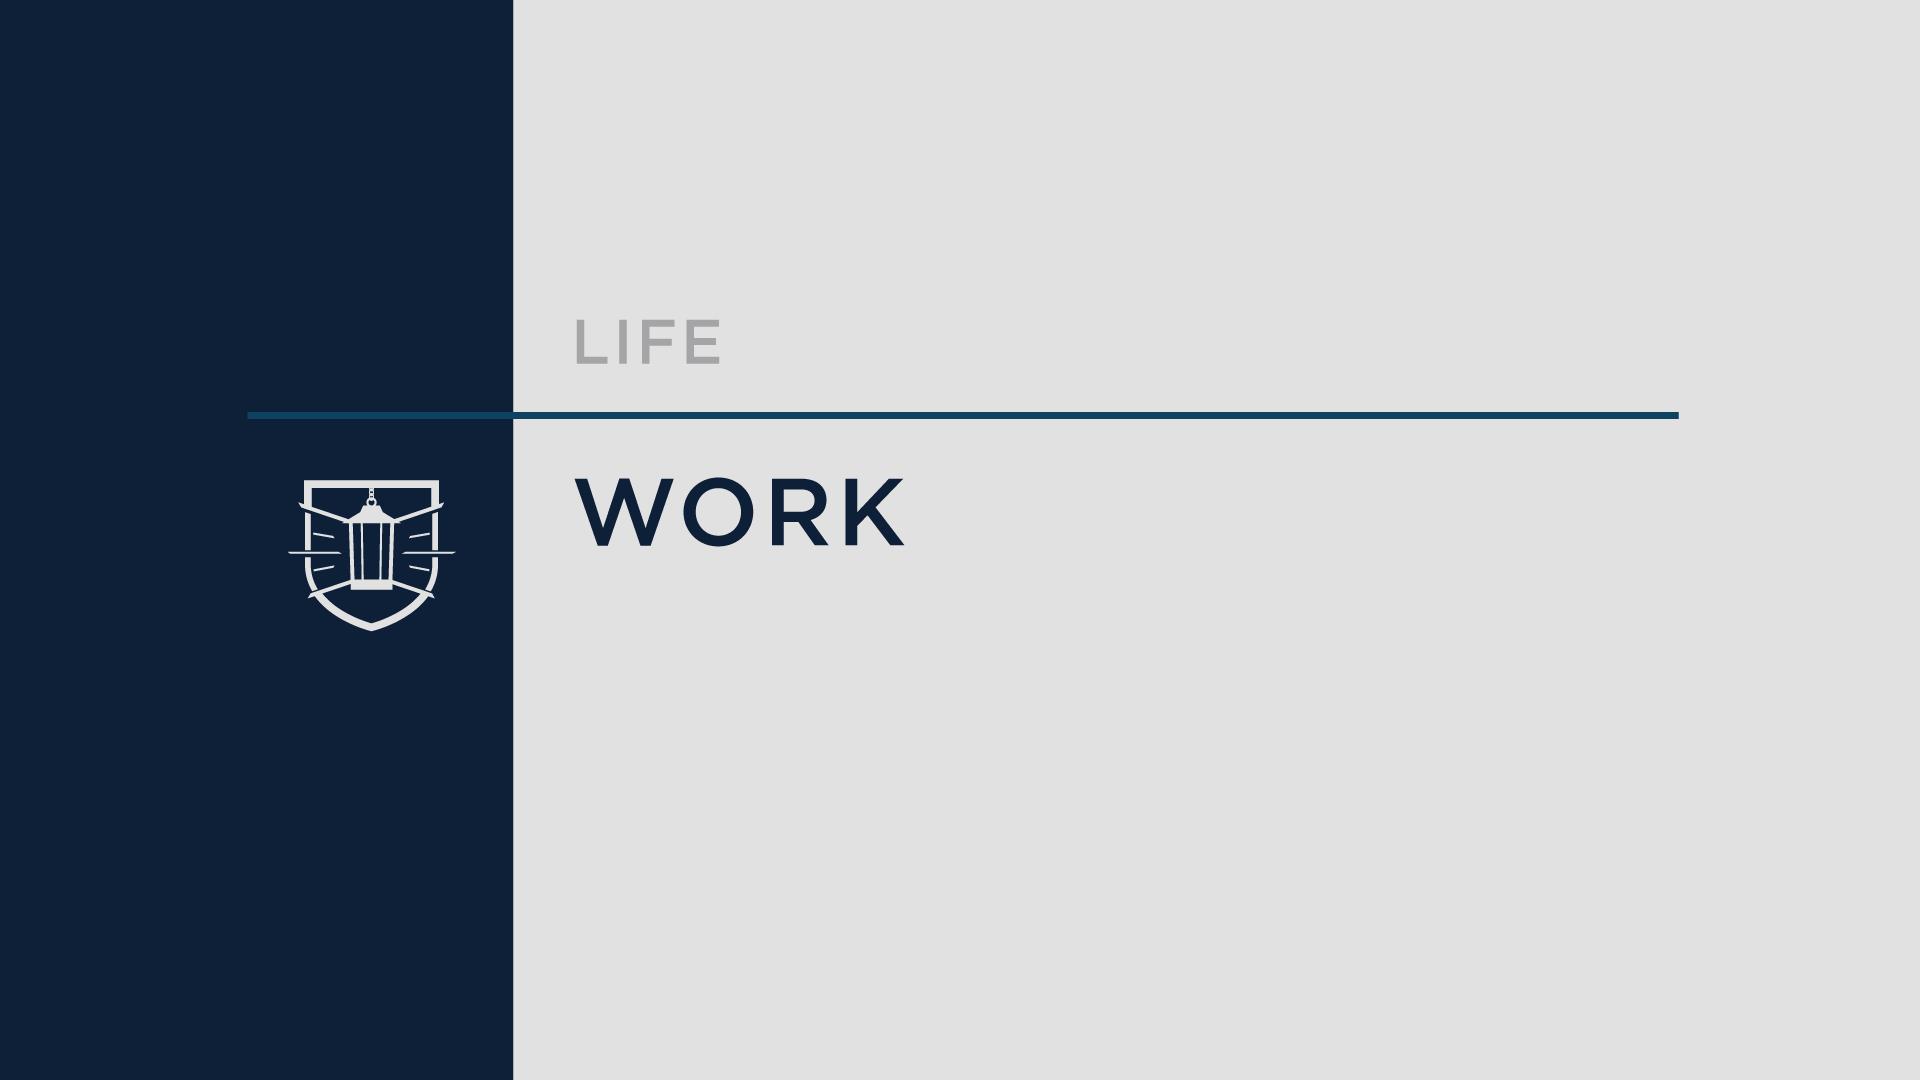 Life 3: Work